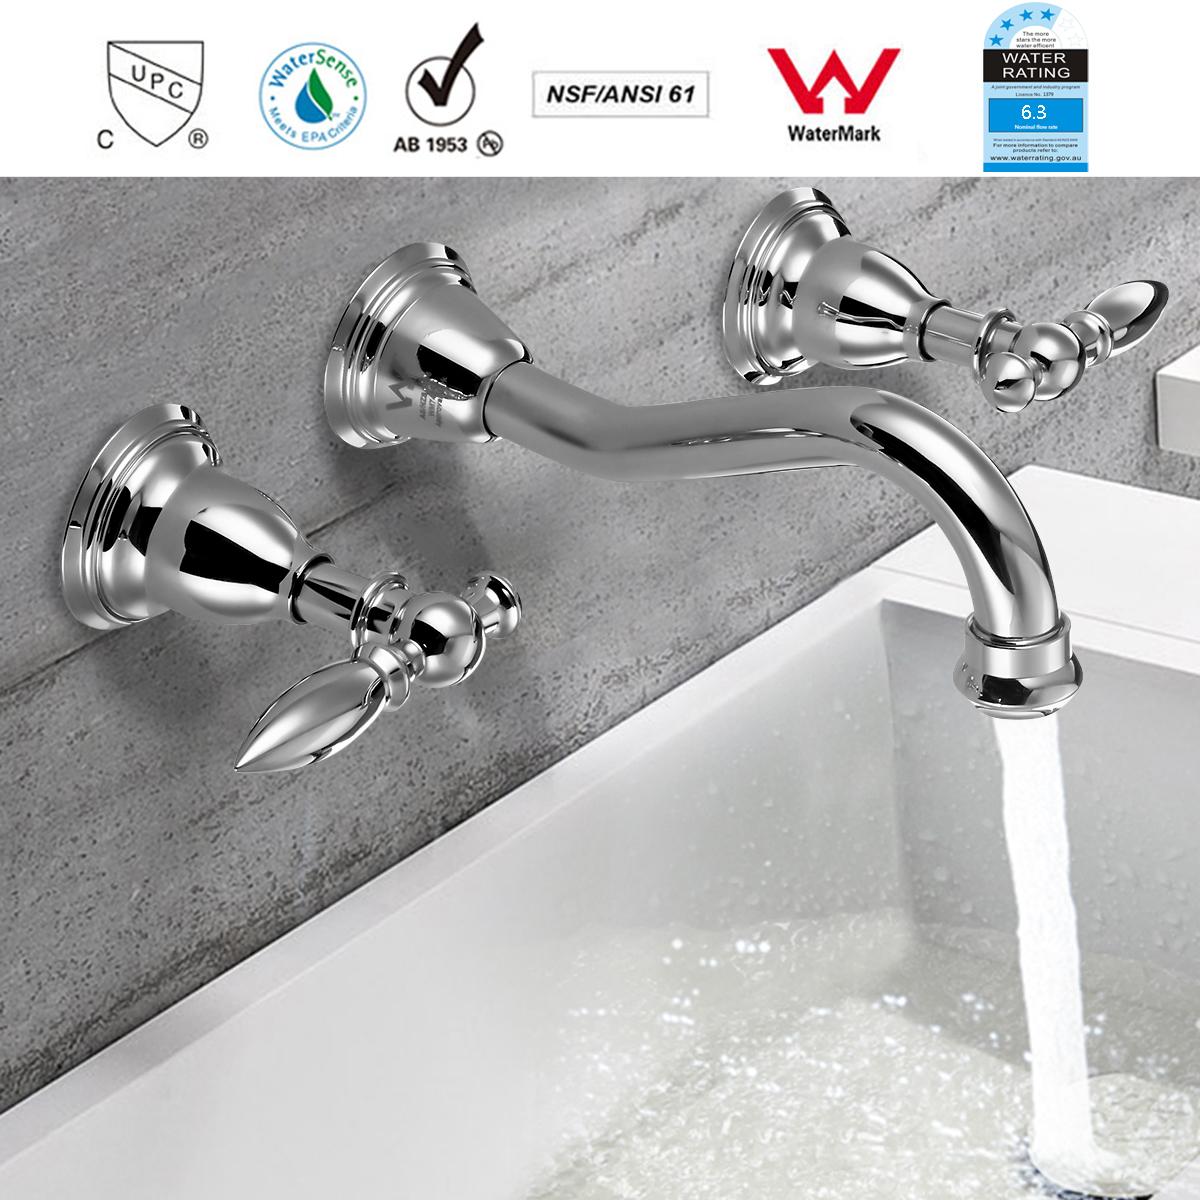 Catalogue Kitea Salle De Bain ~ tempsa robinet mitigeur baignoire salle de bain watermark wels